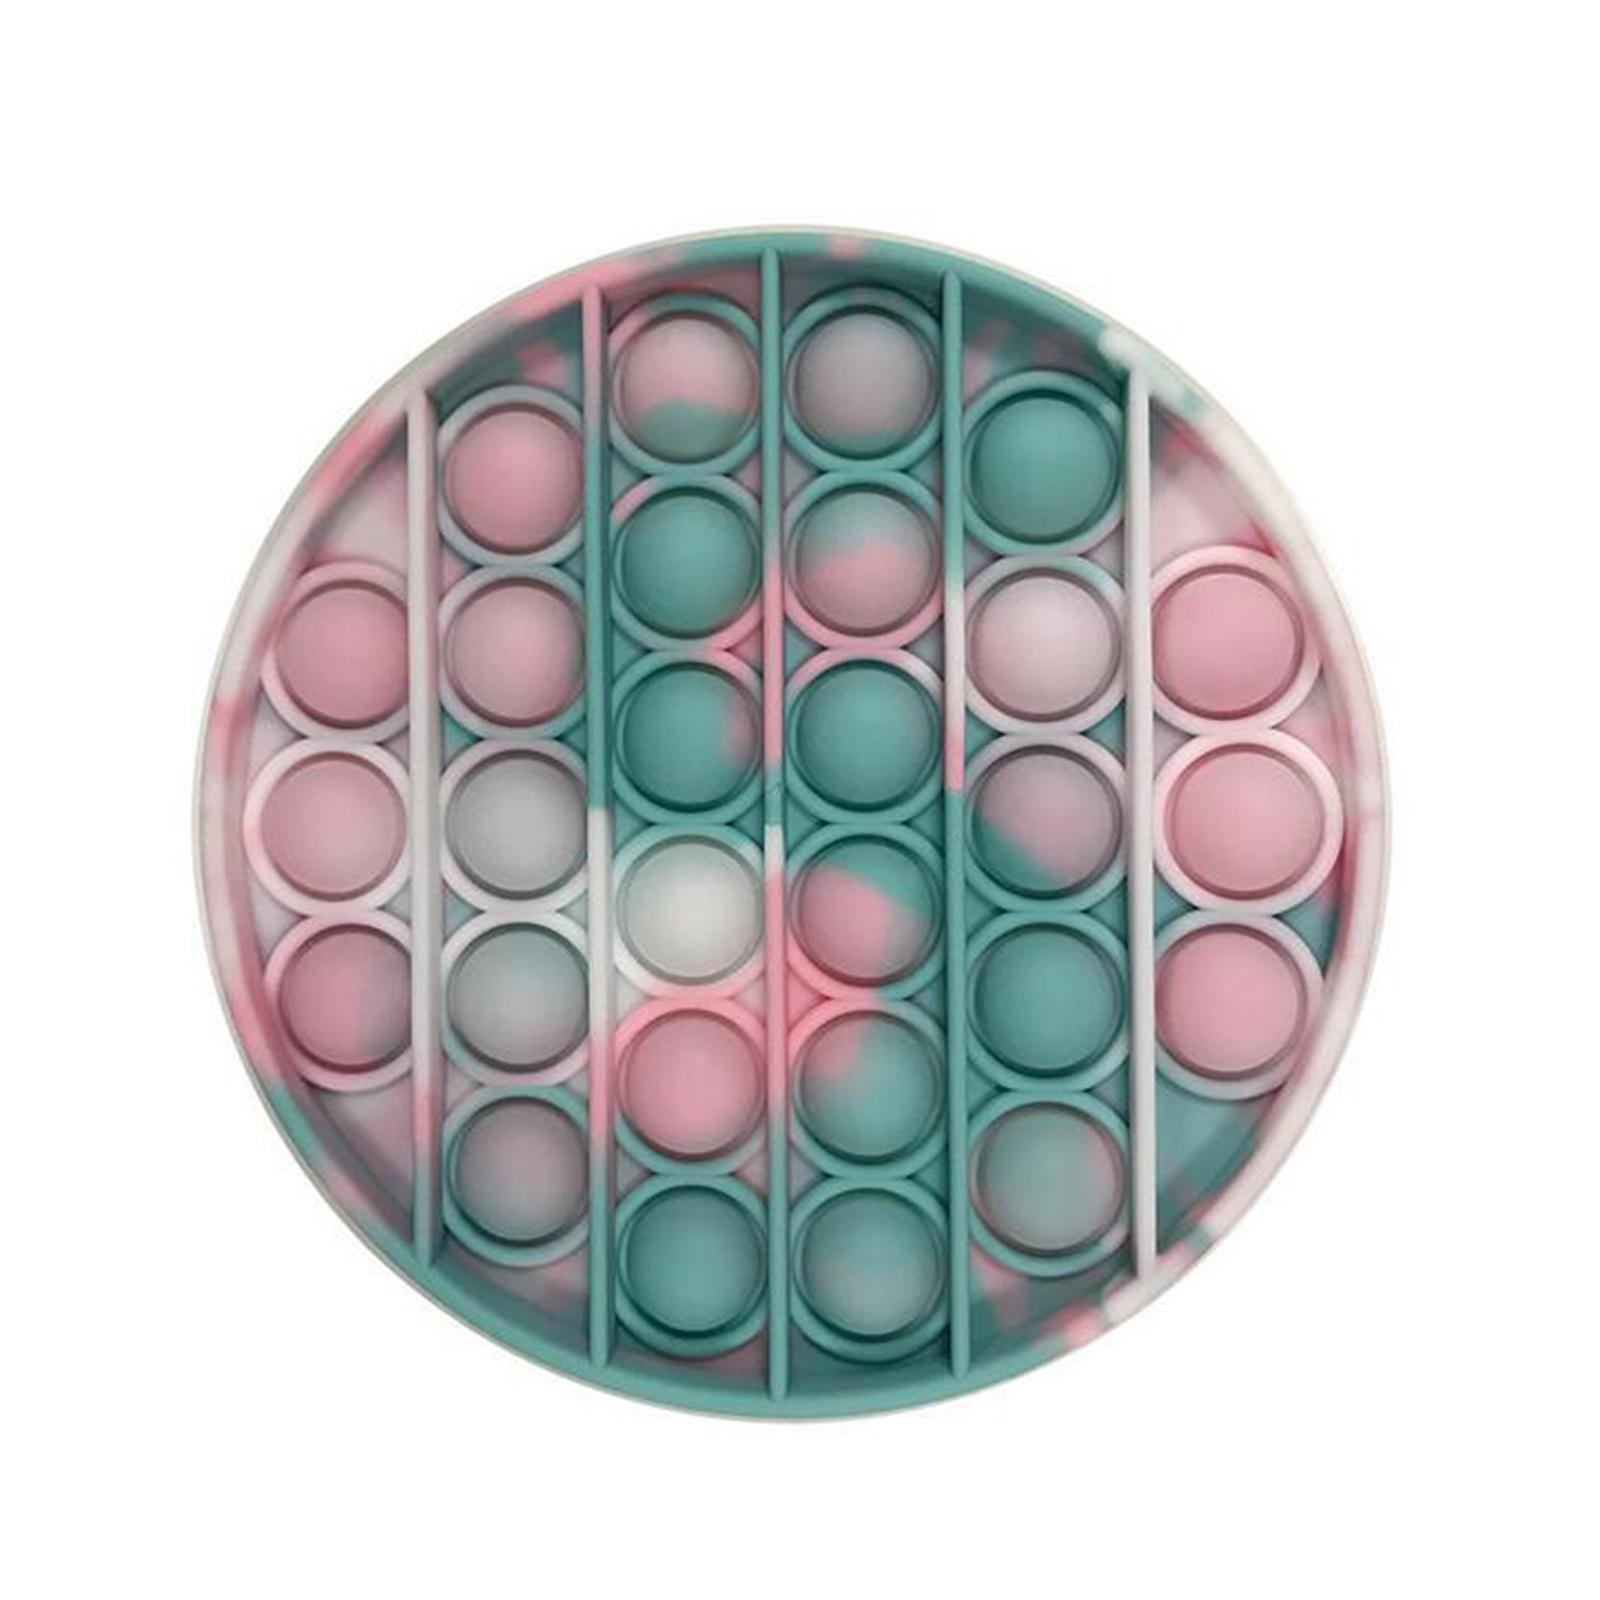 PopIt Hot Push Bubble Fidget Toys Adult Stress Relief Toy Antistress PopIt Soft Squishy Anti-Stress Gift Anti Stress Box ??? ??* img4